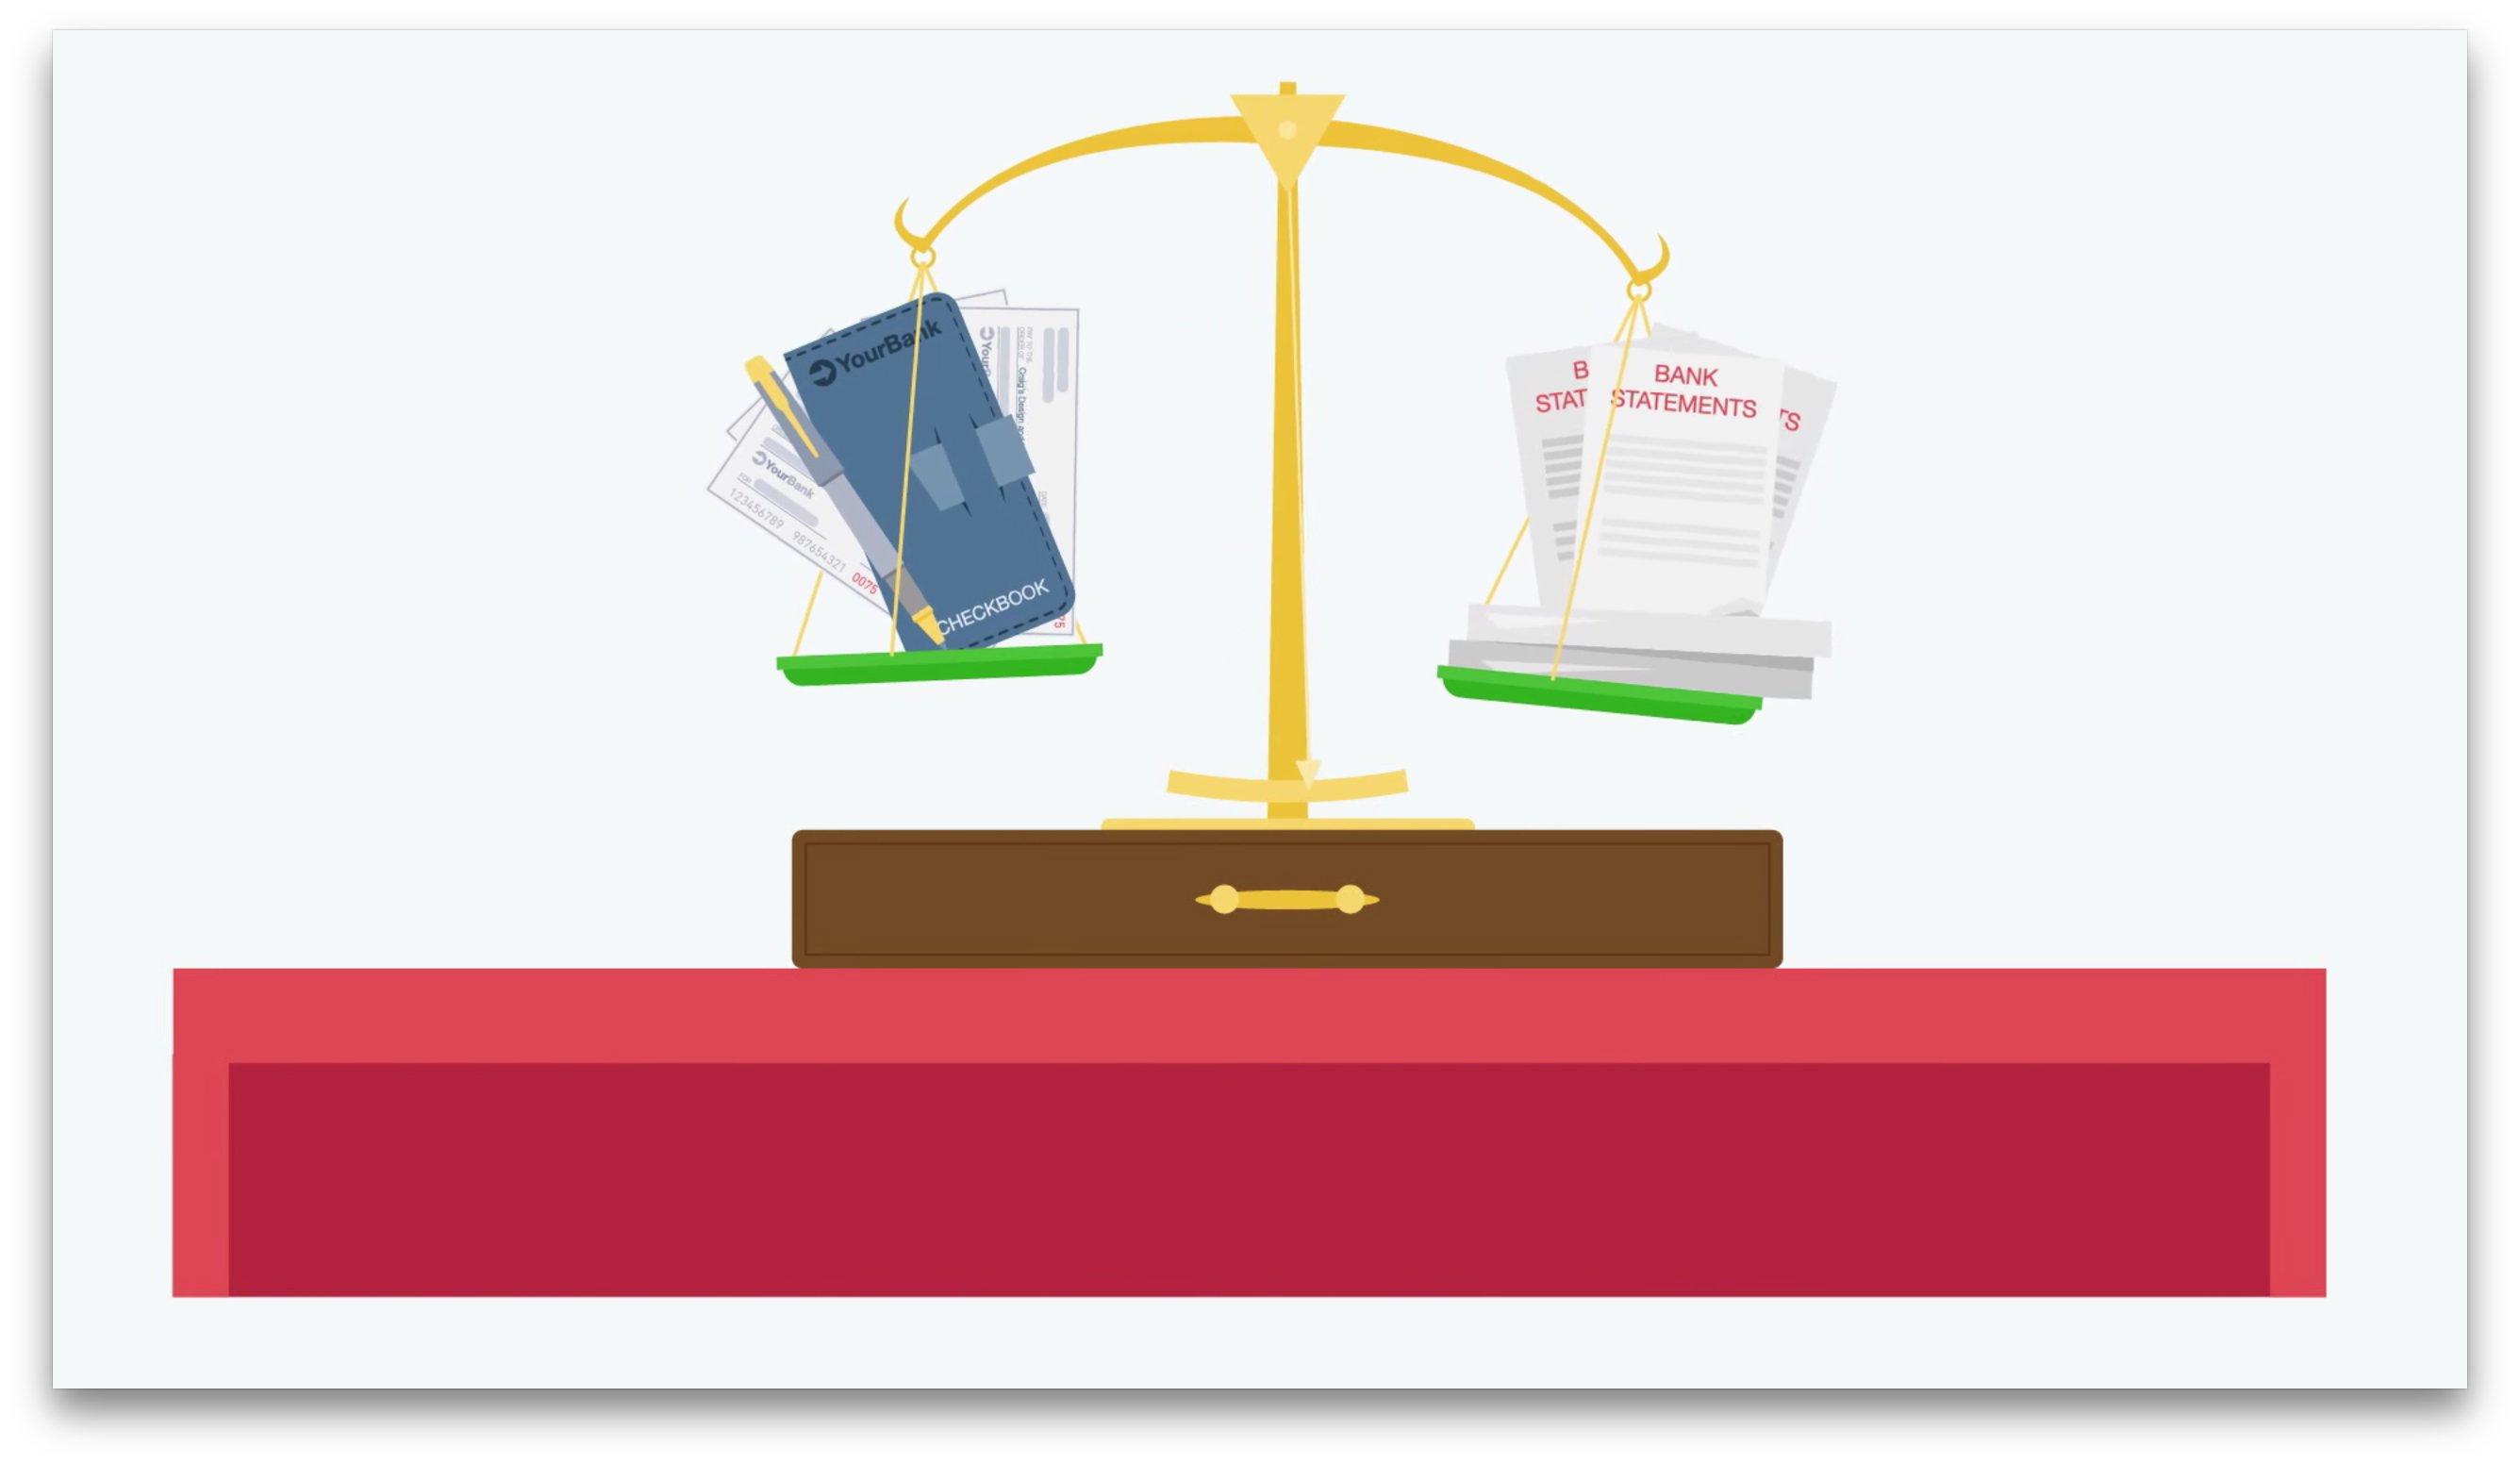 Reconcile-Accounts-copy